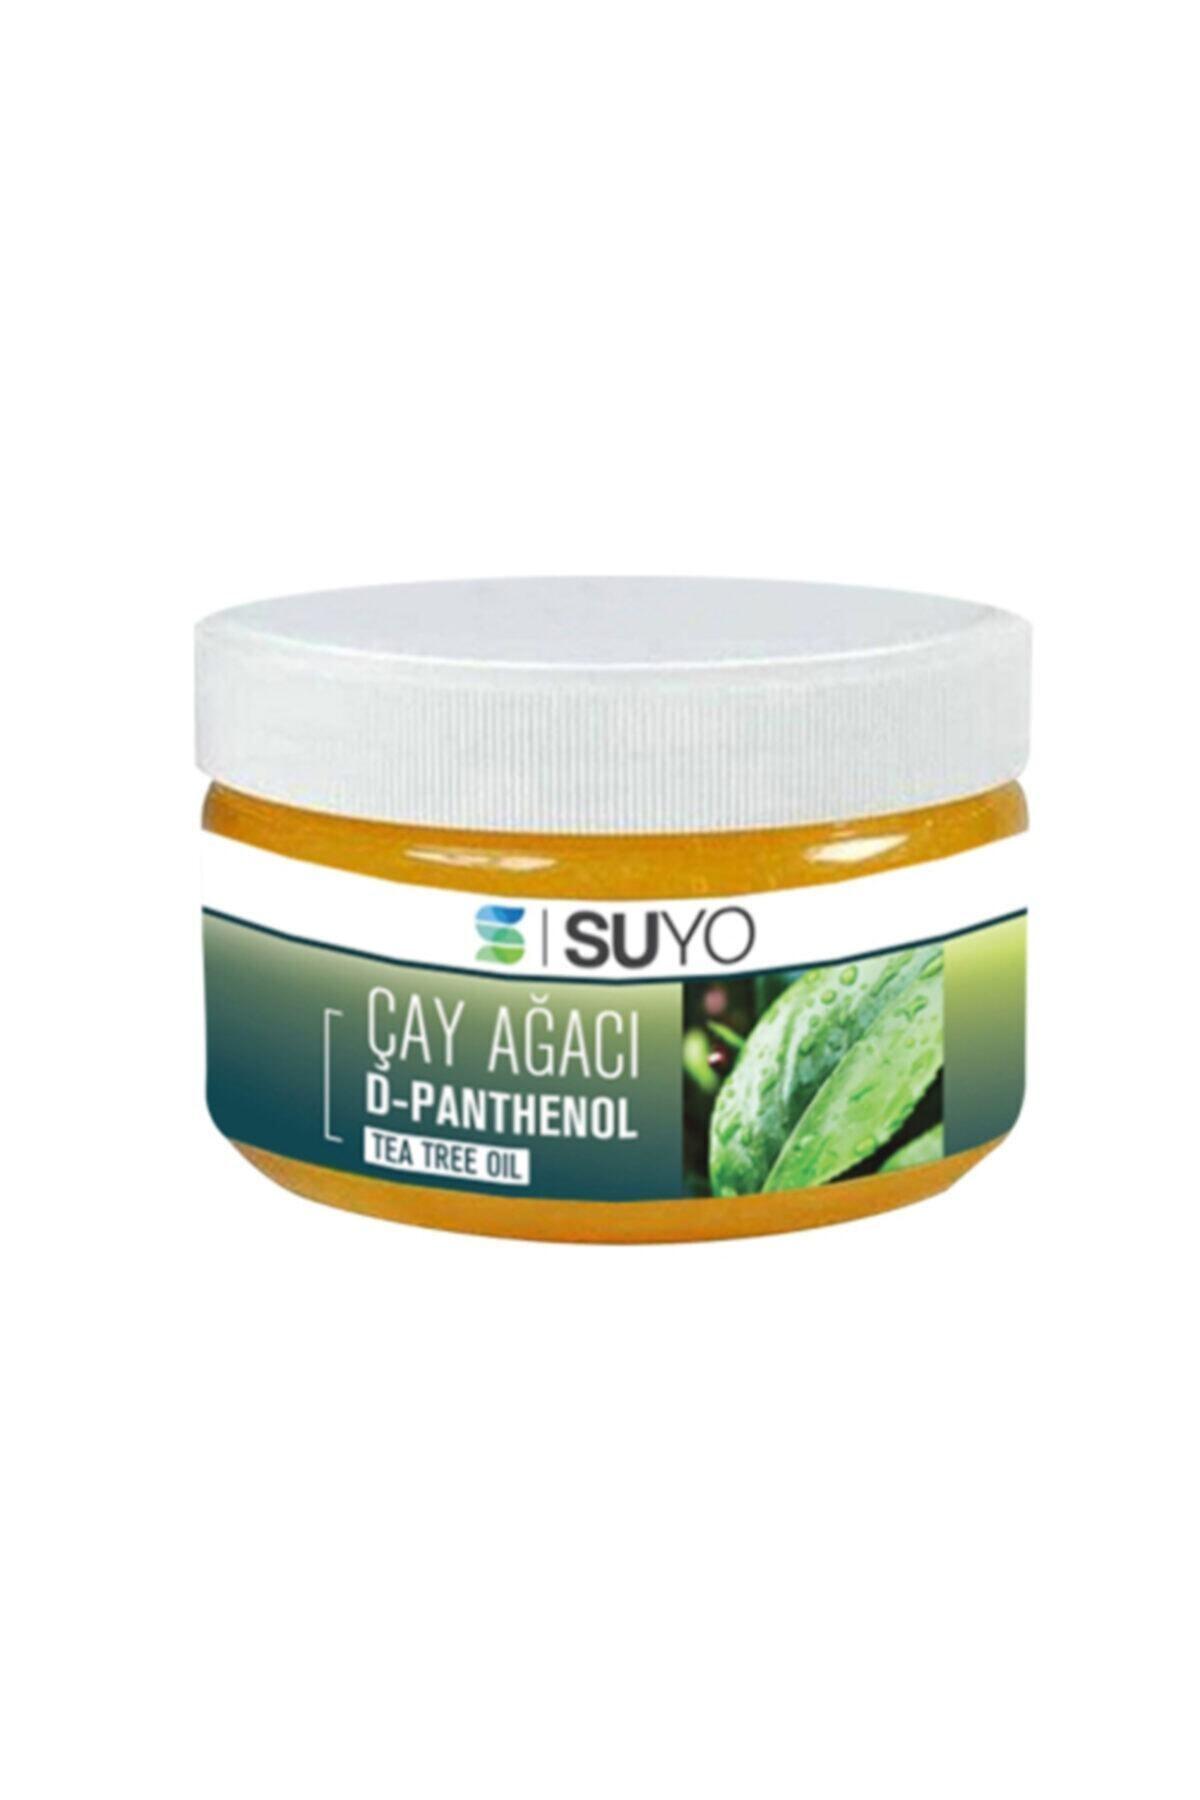 GreenFarma Suyo Çay Ağacı Merhemi 200 Ml 1